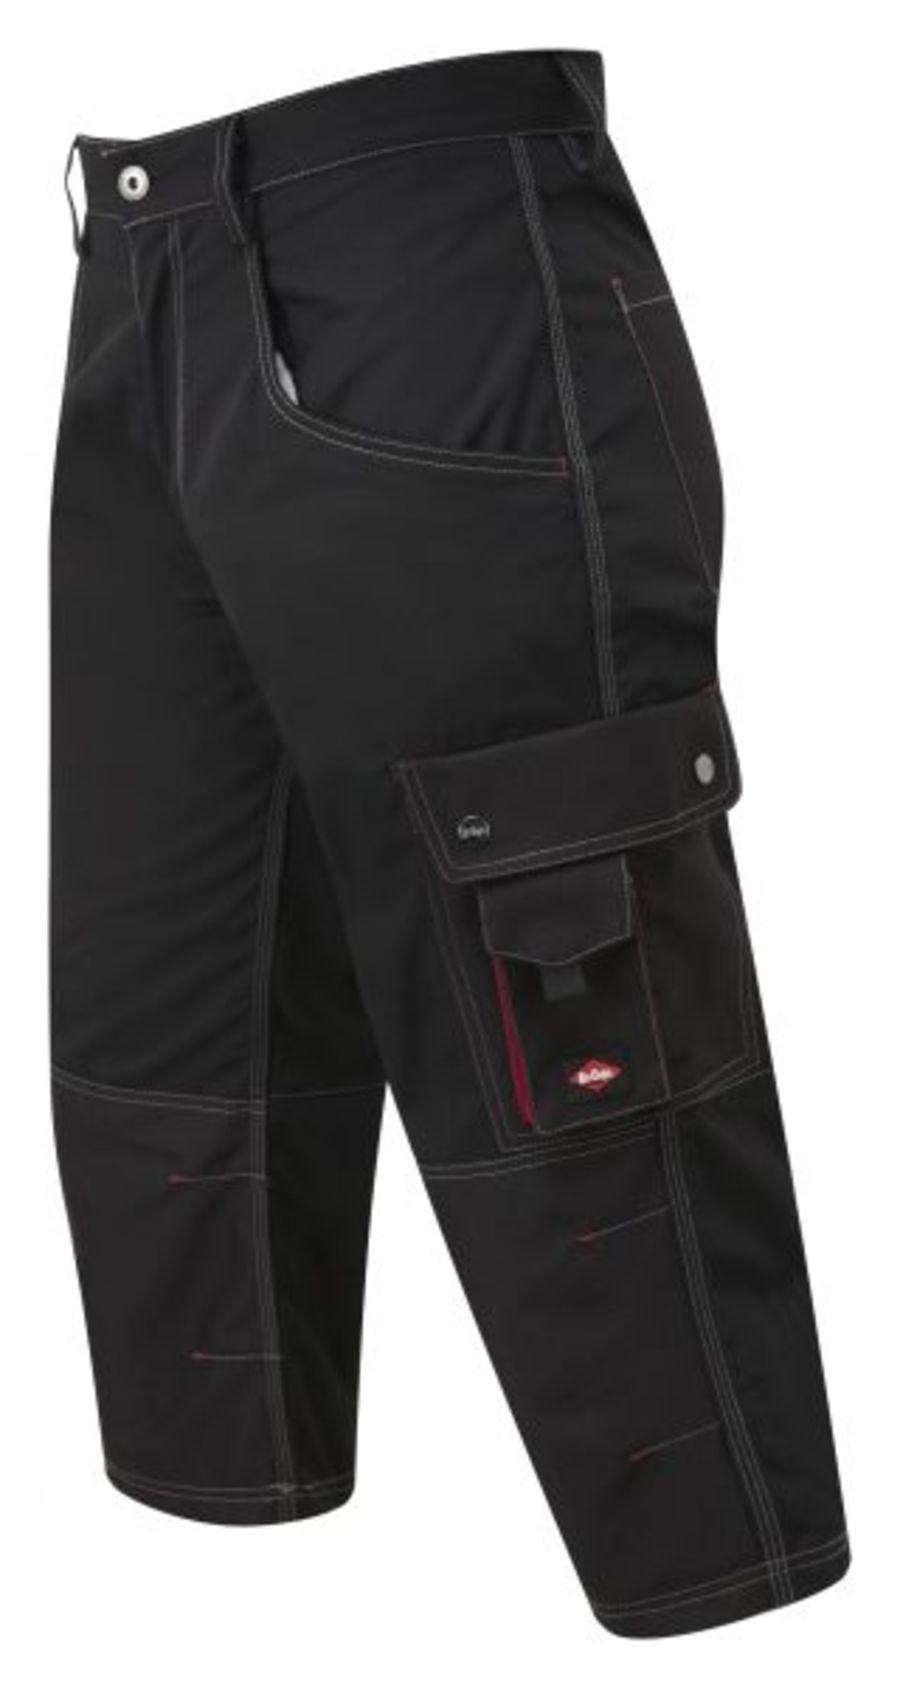 Lee Cooper 3/4 Length Cargo Shorts